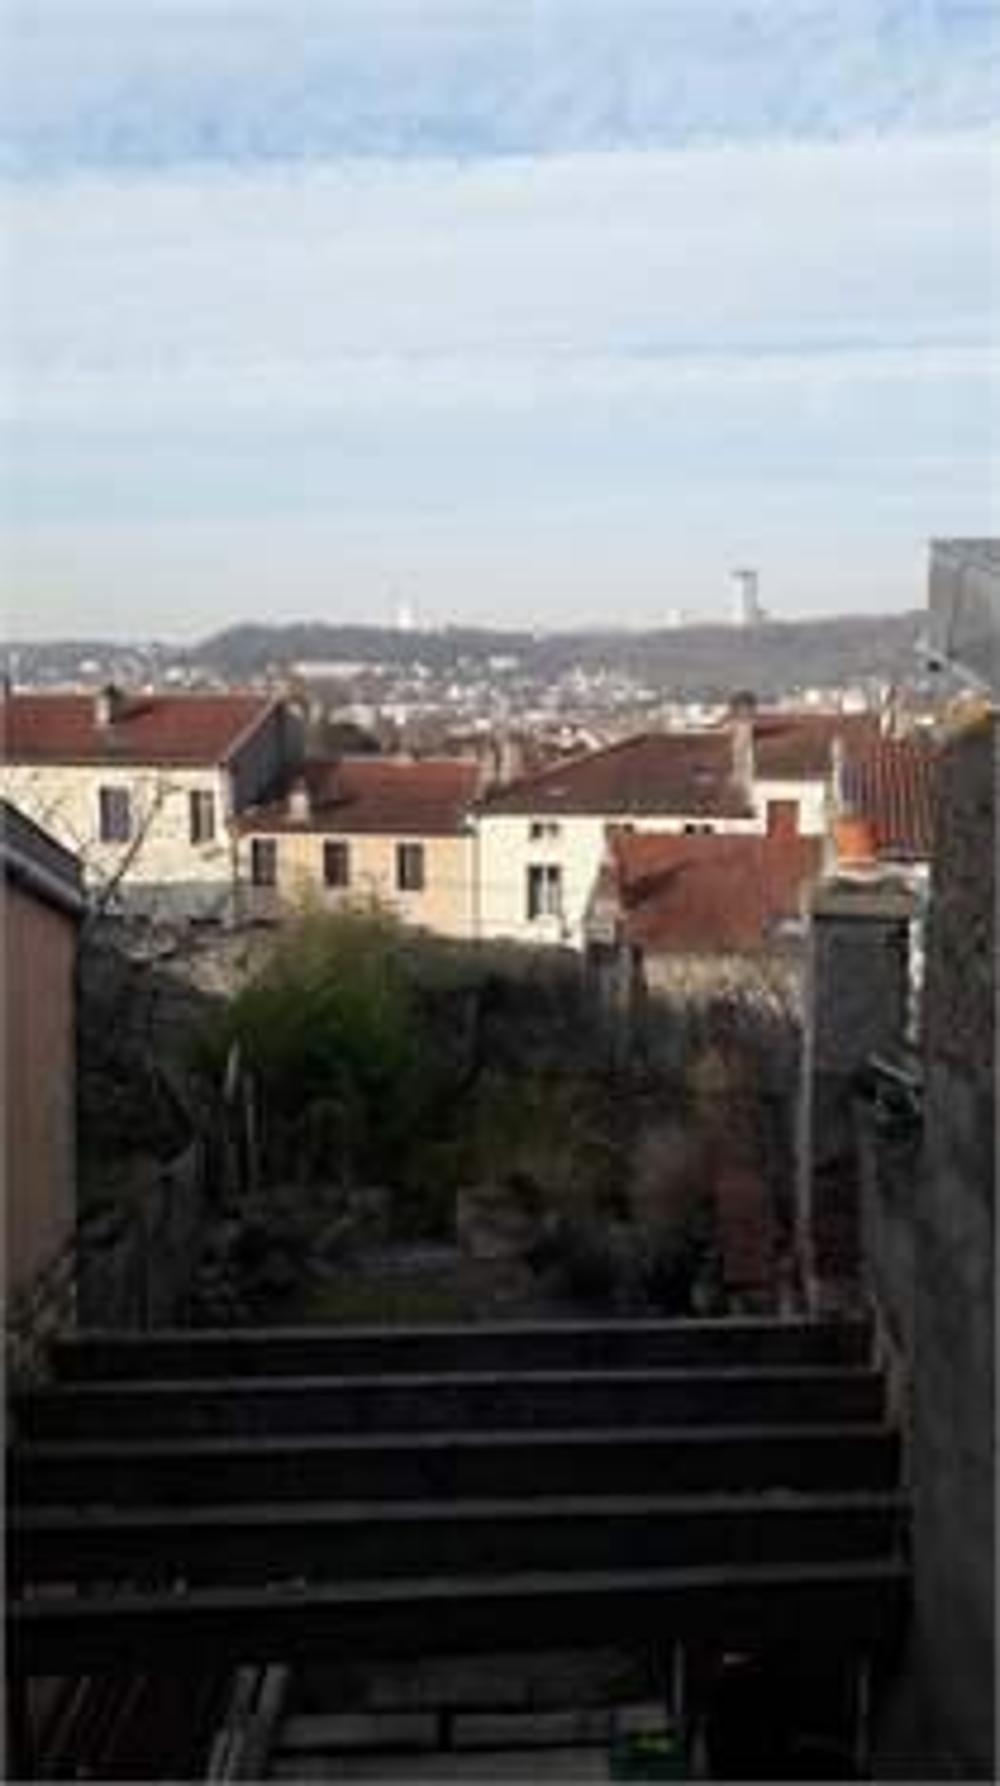 Malzéville Meurthe-et-Moselle Apartment Bild 3569849